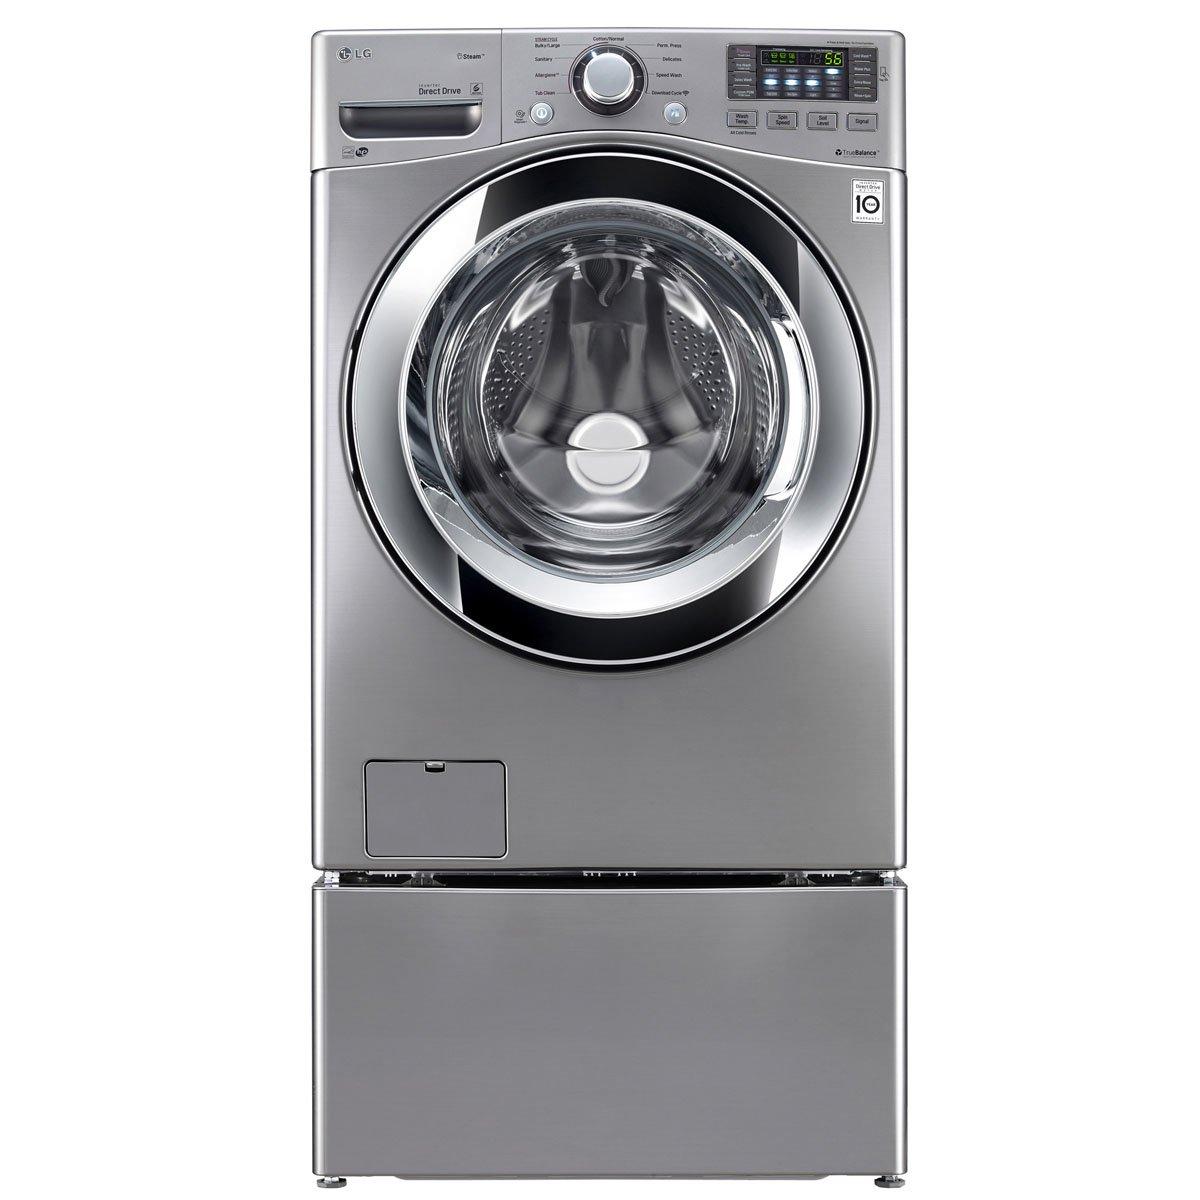 Lavadora lg frontal 20kg lavadora compatible sears com - Fotos de lavadoras ...